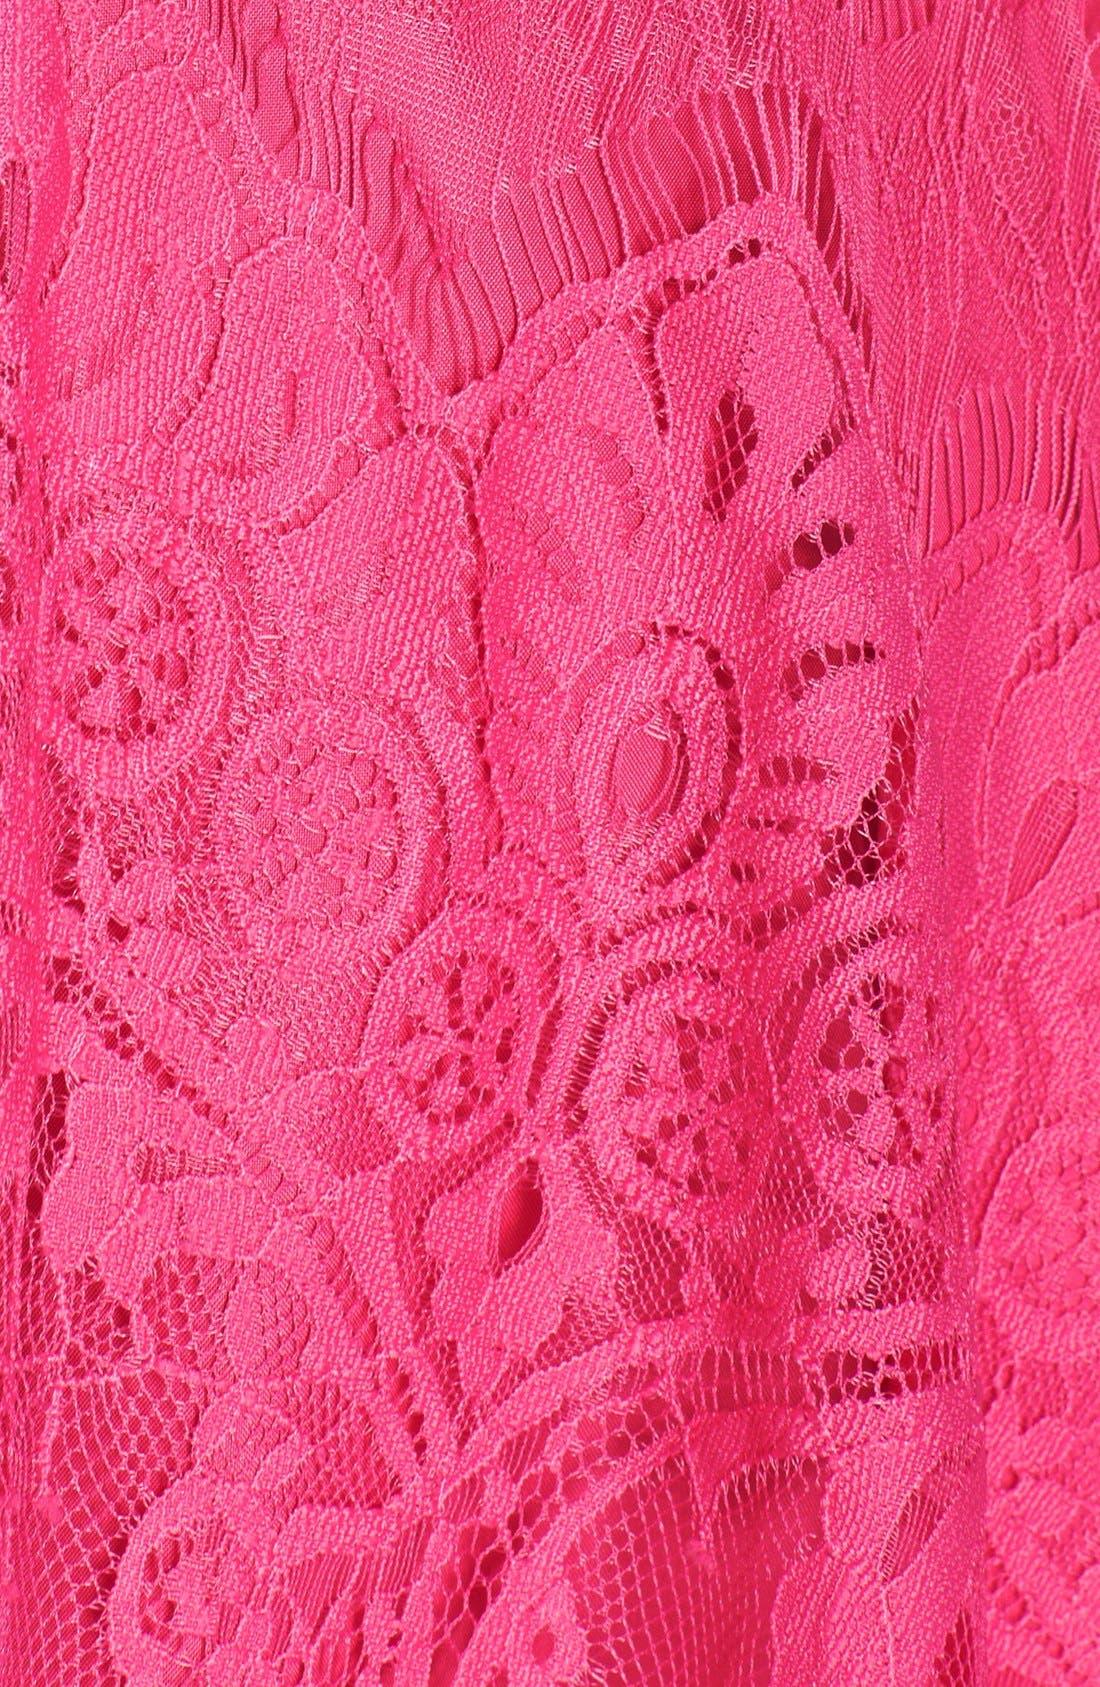 'Rhianna' Illusion Yoke Lace Fit & Flare Dress,                             Alternate thumbnail 4, color,                             Fuchsia/ Rose